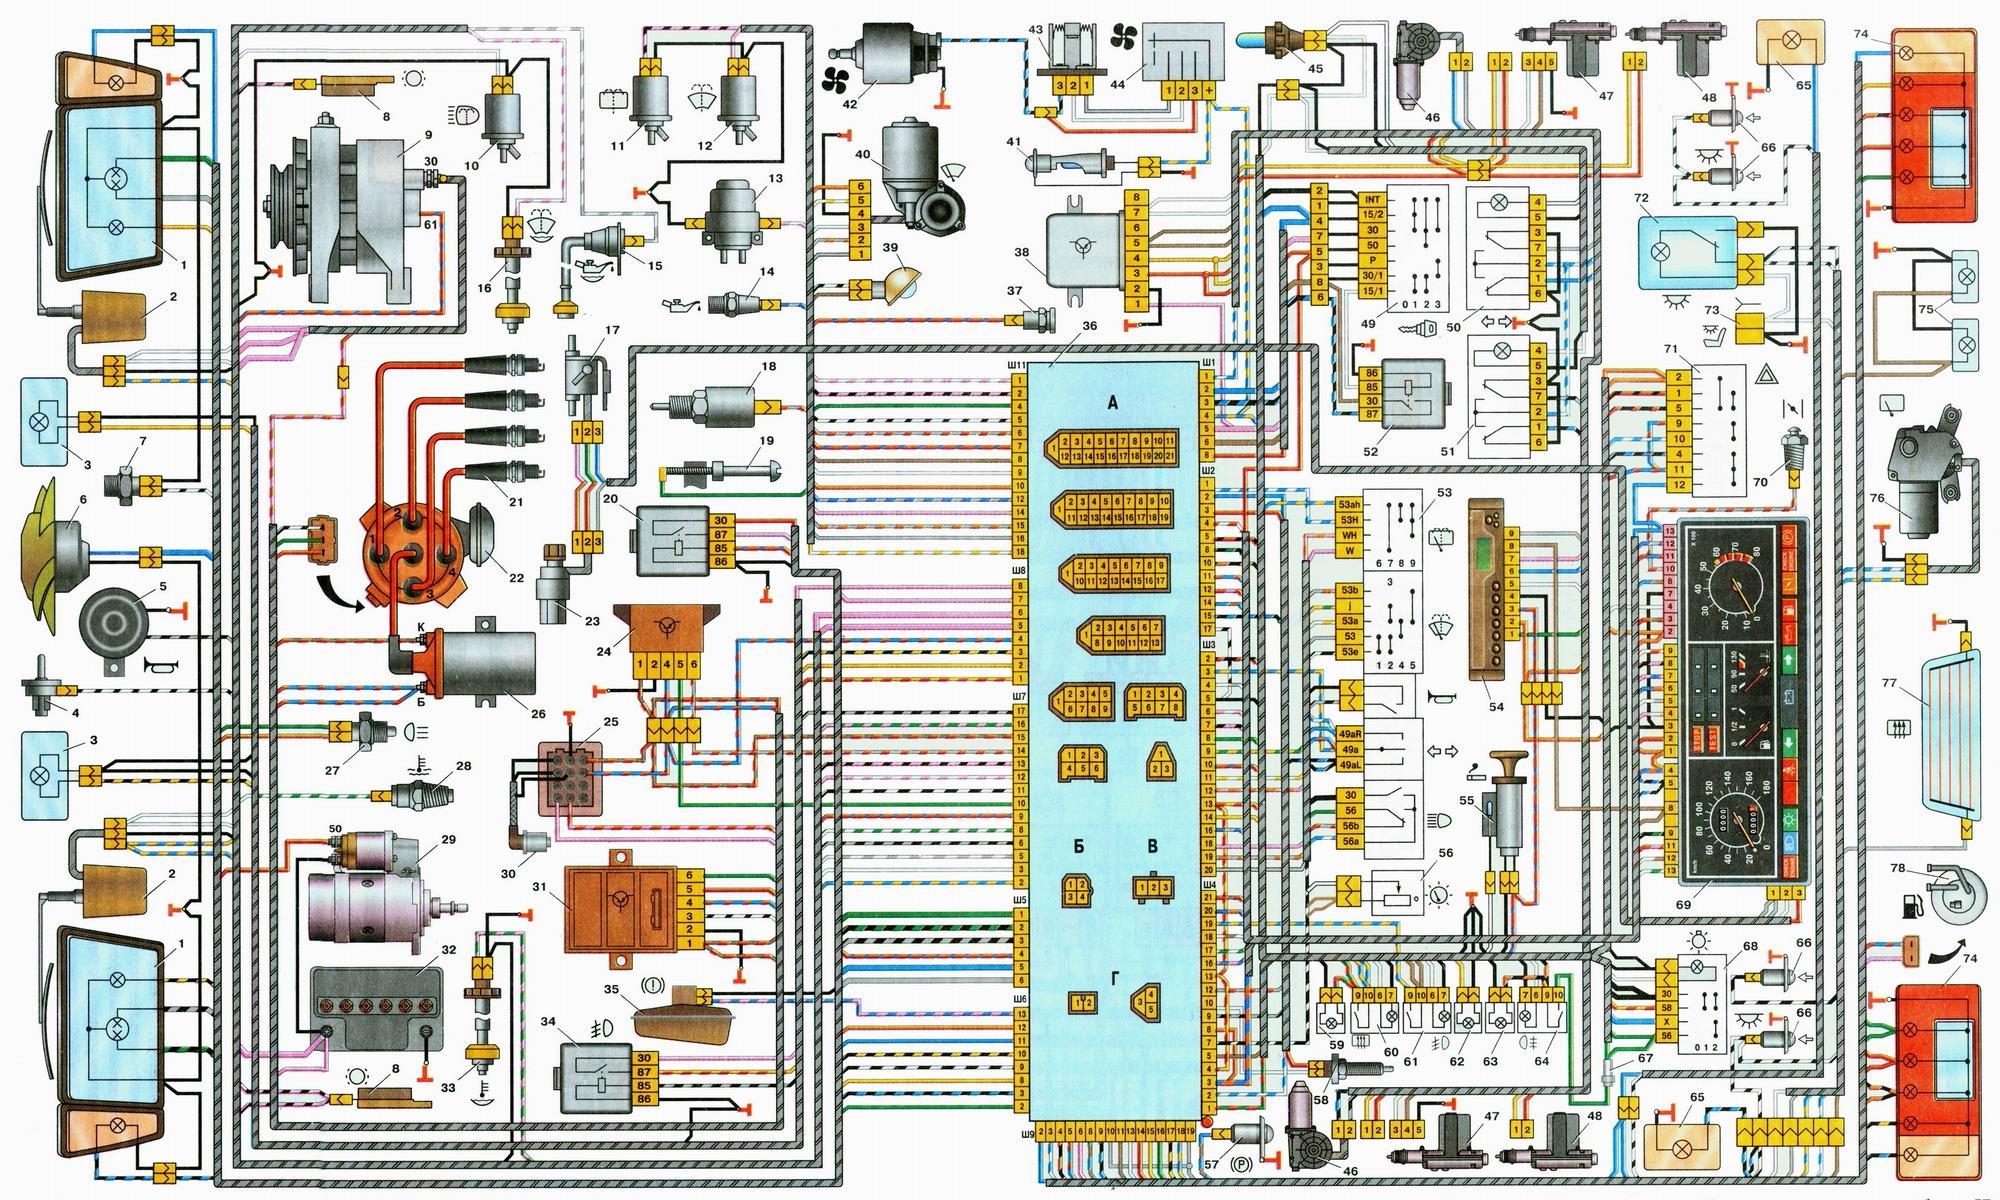 Lt b gt схема lt b gt электрооборудования lt b gt ваз lt b gt lt b gt 2109 lt b gt.